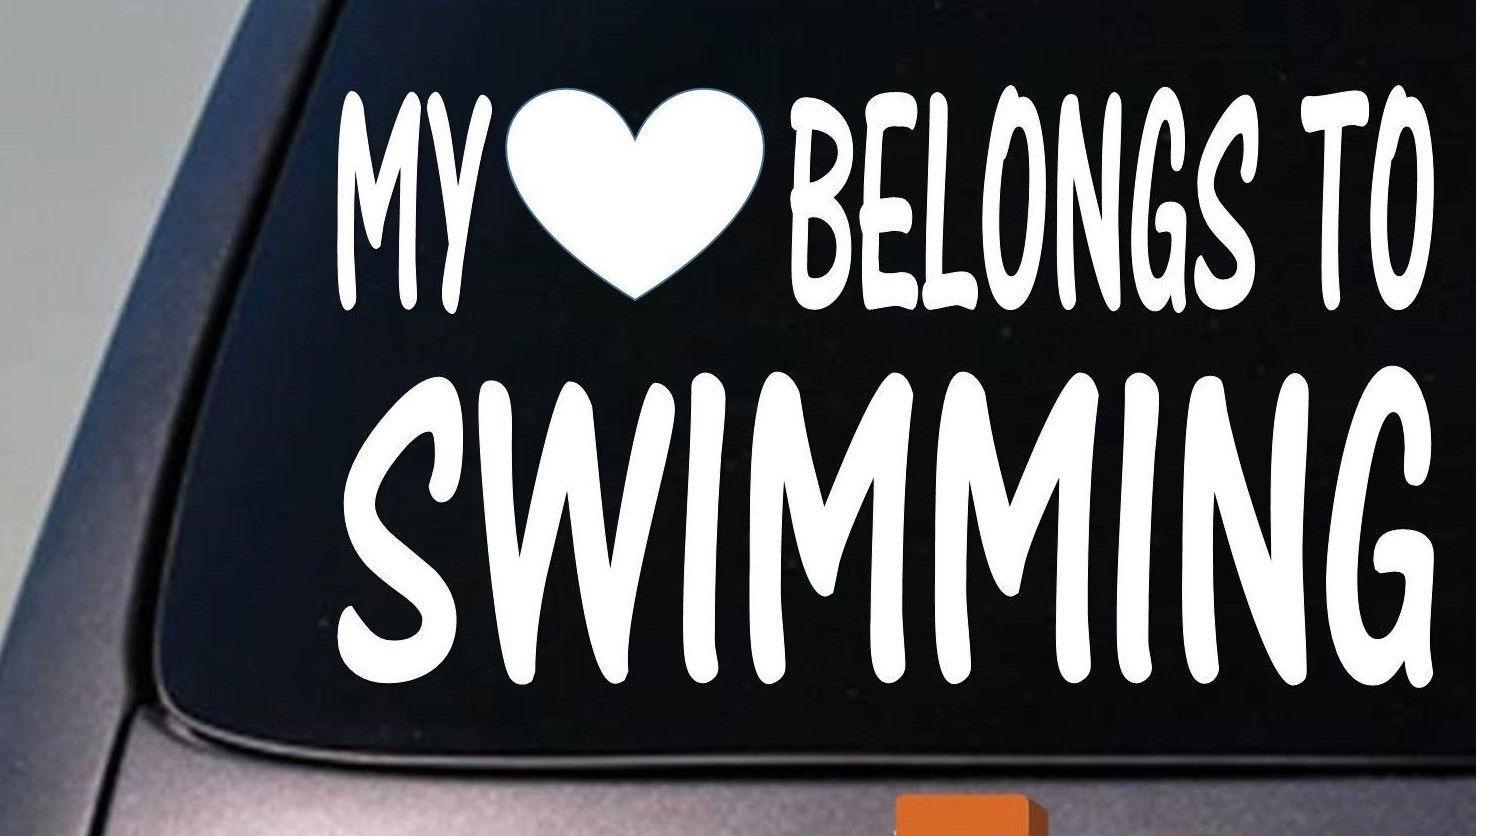 My heart belongs to swimming sticker decal *D862*